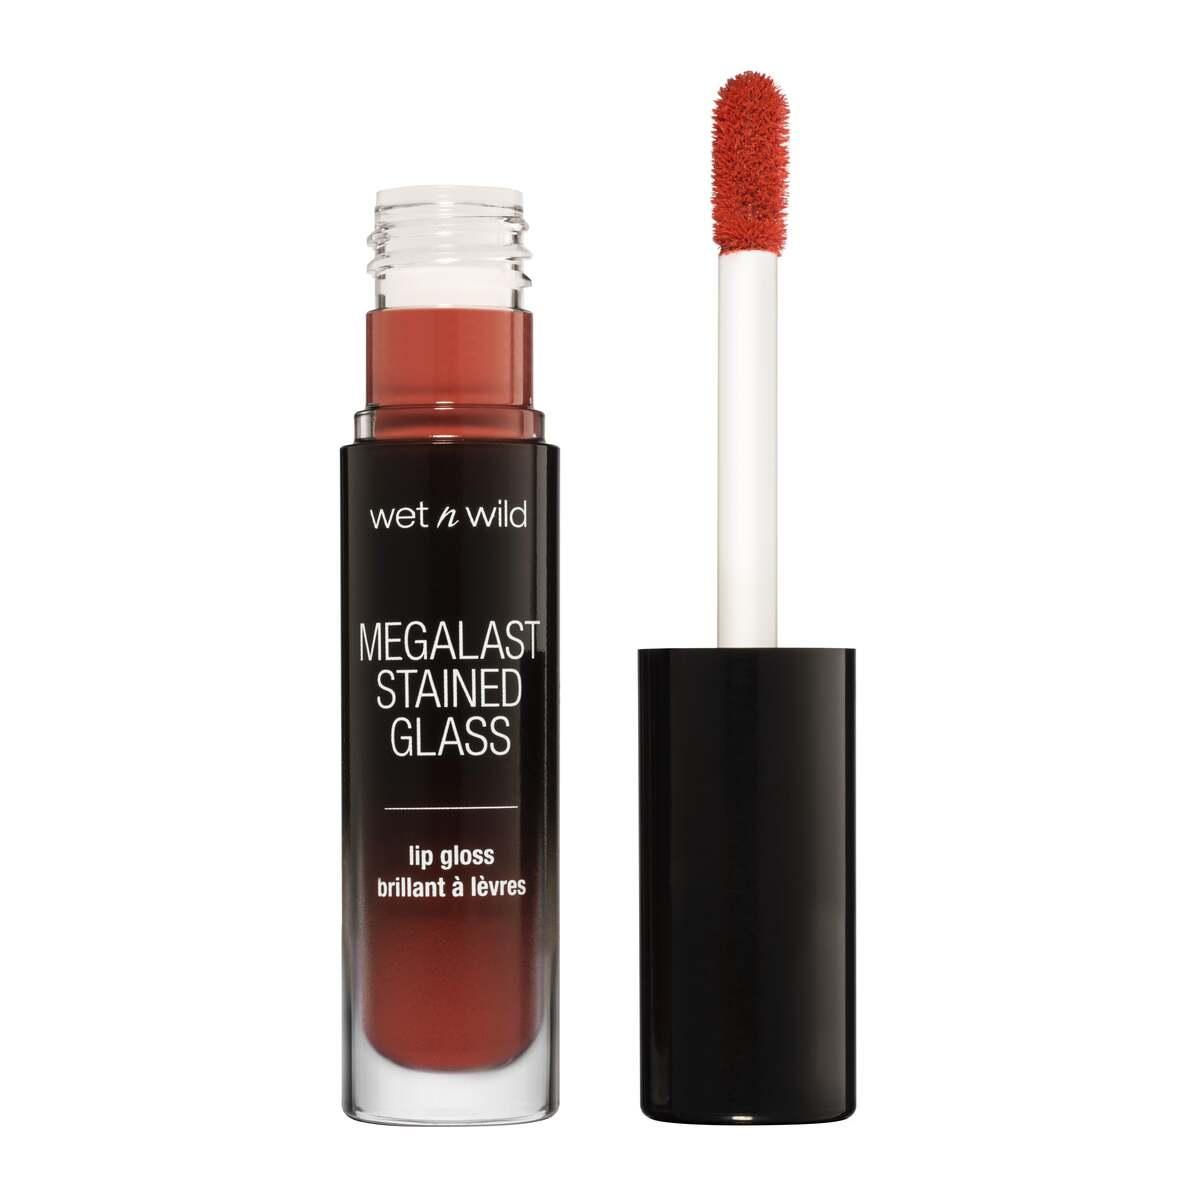 Bild 2 von wet n wild Megalast Stained glass Lip Gloss - REFLECTIVE KISSES